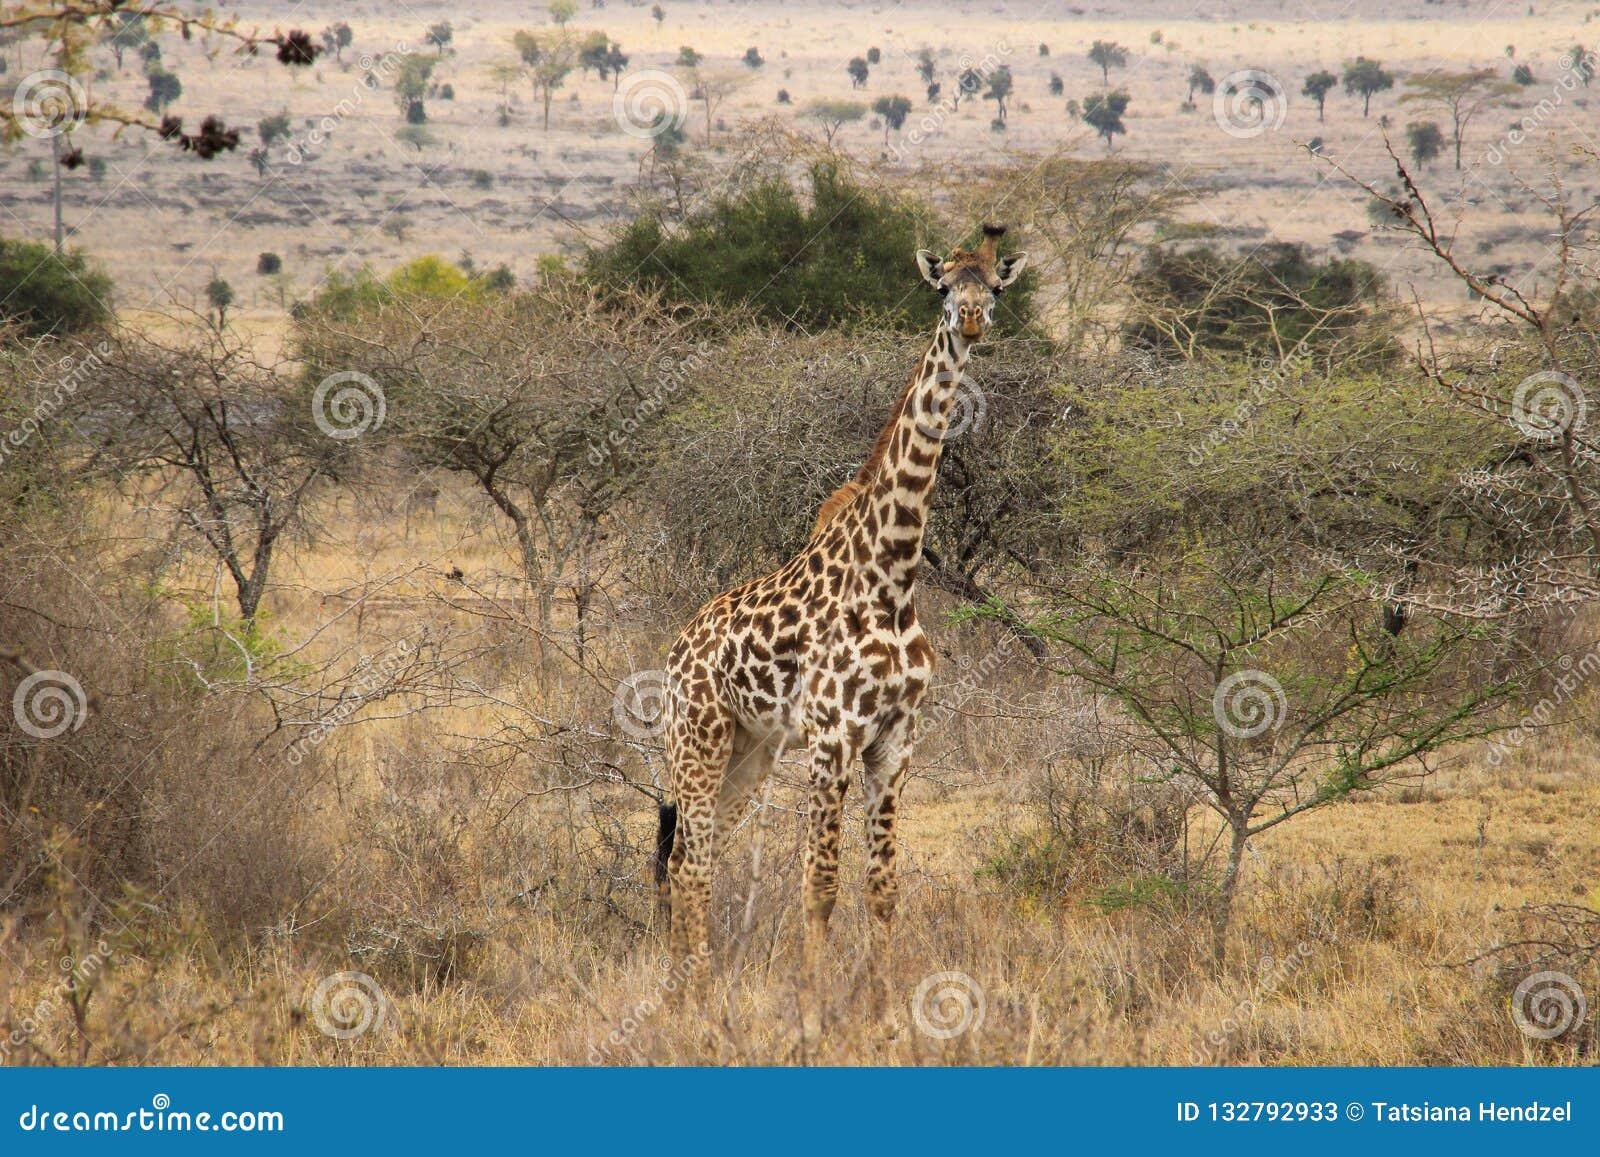 African giraffes graze in the savannah. Wildlife Africa.